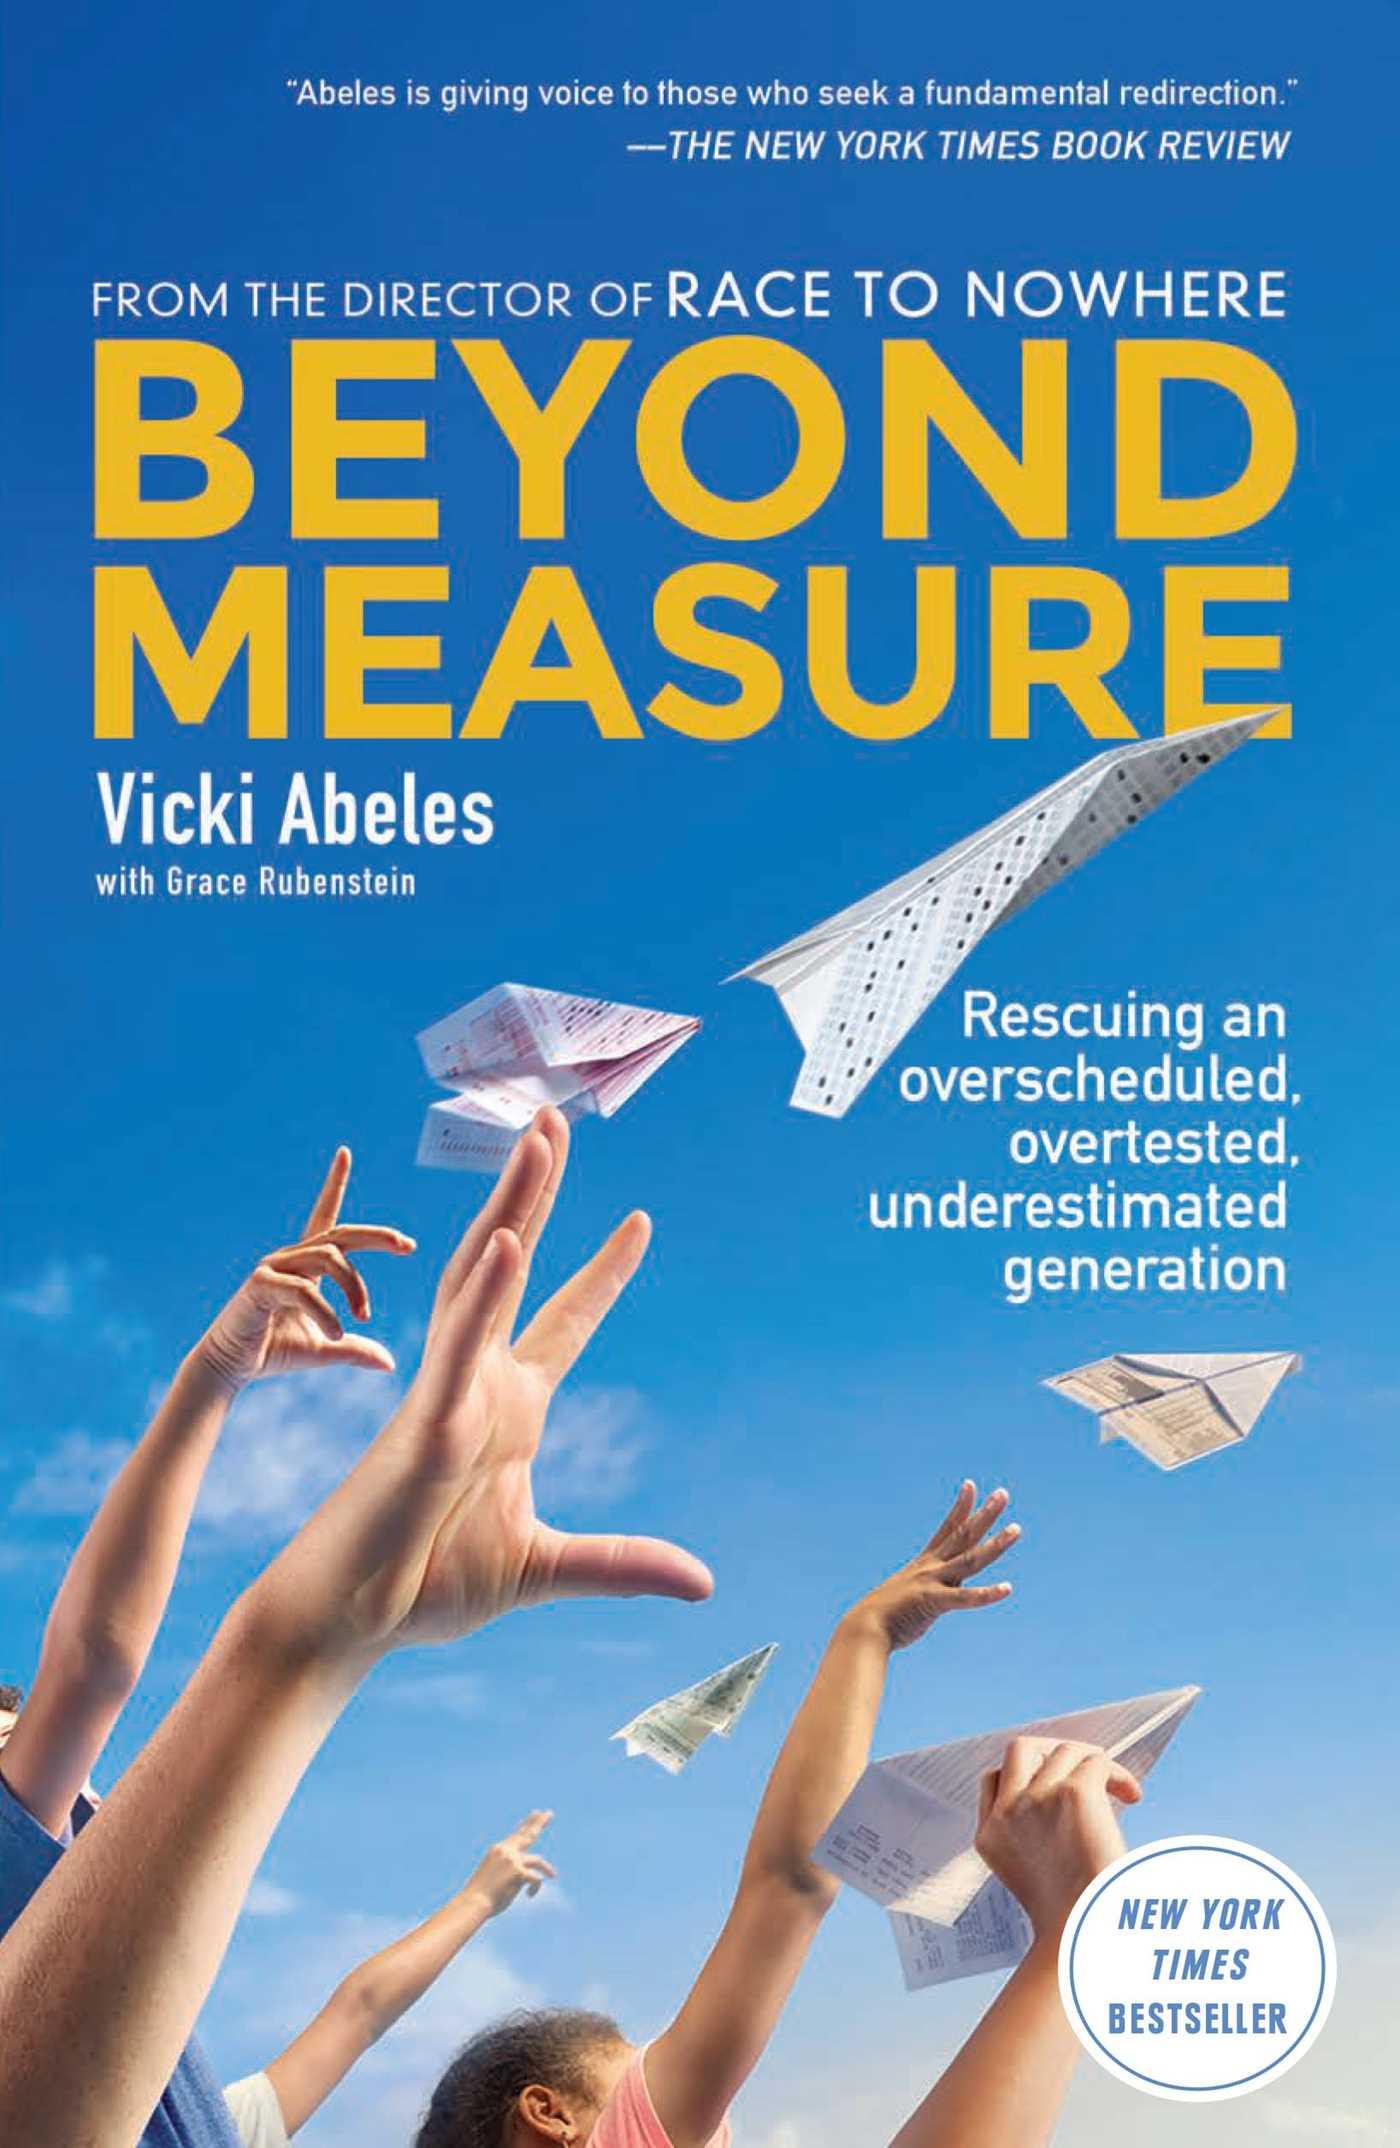 Beyond measure 9781451699241 hr